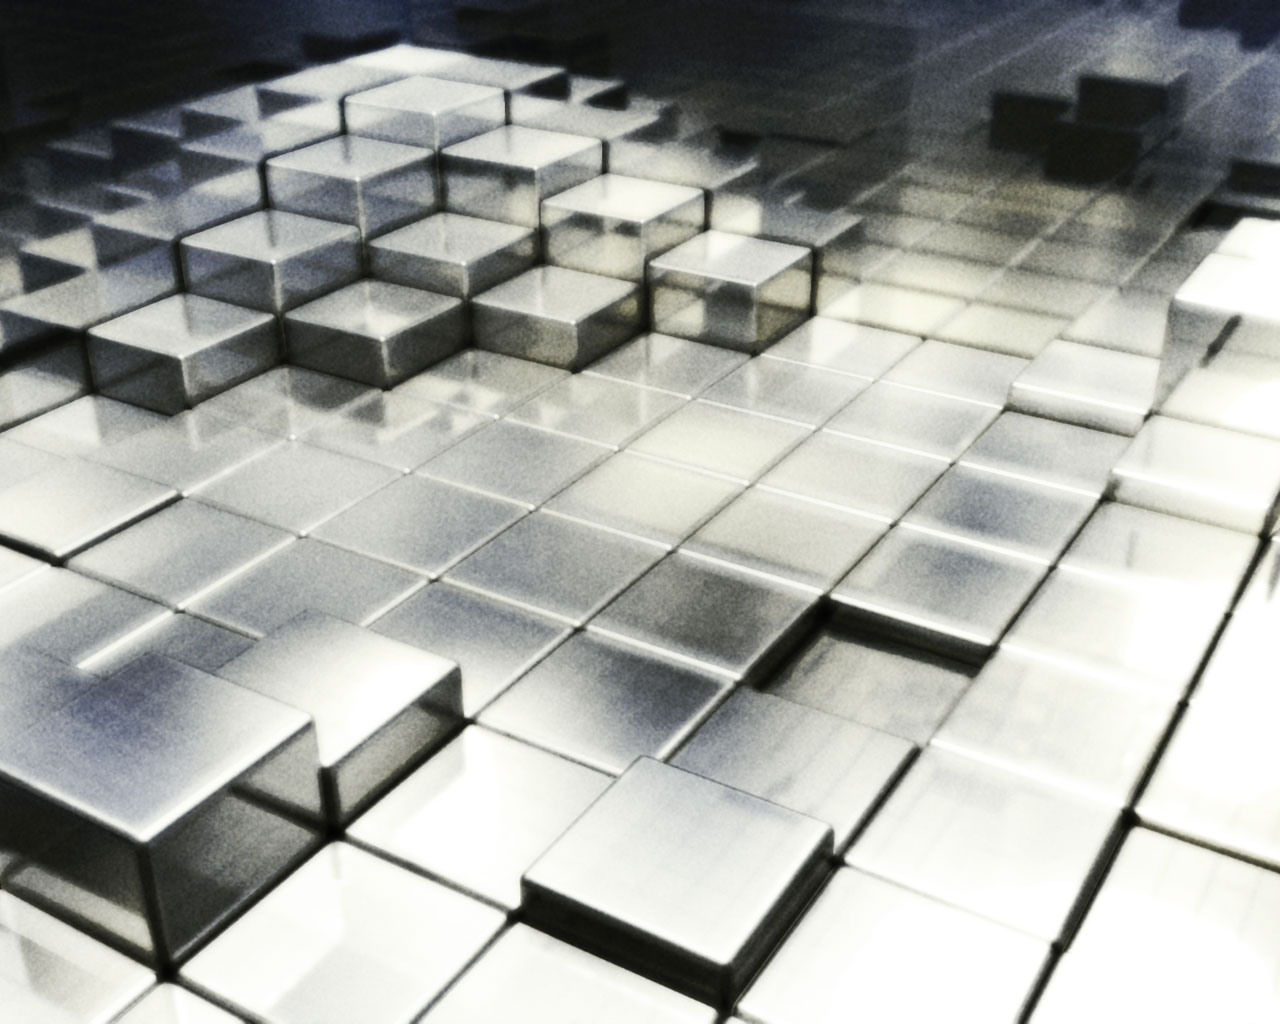 Cubes 800x600 · Cubes 1024x768 · Cubes 1280x1024 · Cubes 1600x1200